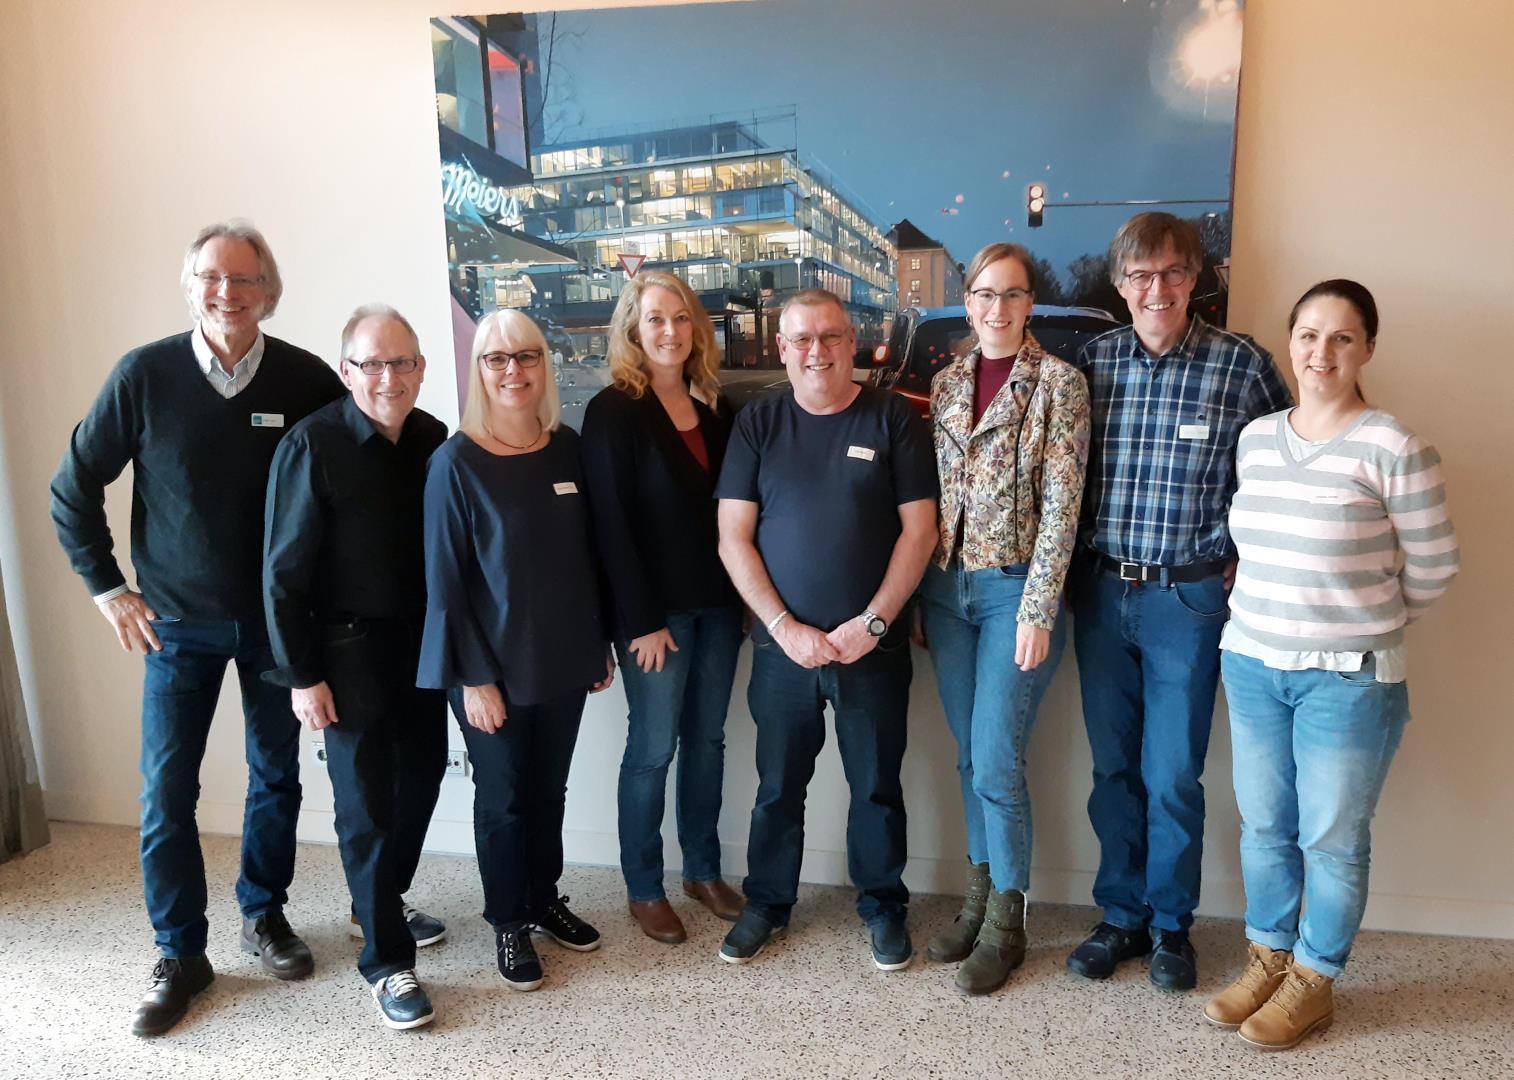 v.li.: Achim Scholz, Ernst Lorenzen, Diana Brandt Olm, Tanja Patzwald, Uwe Boldt, Nora Jacobs, Sascha Nowack, Oksana Janzen